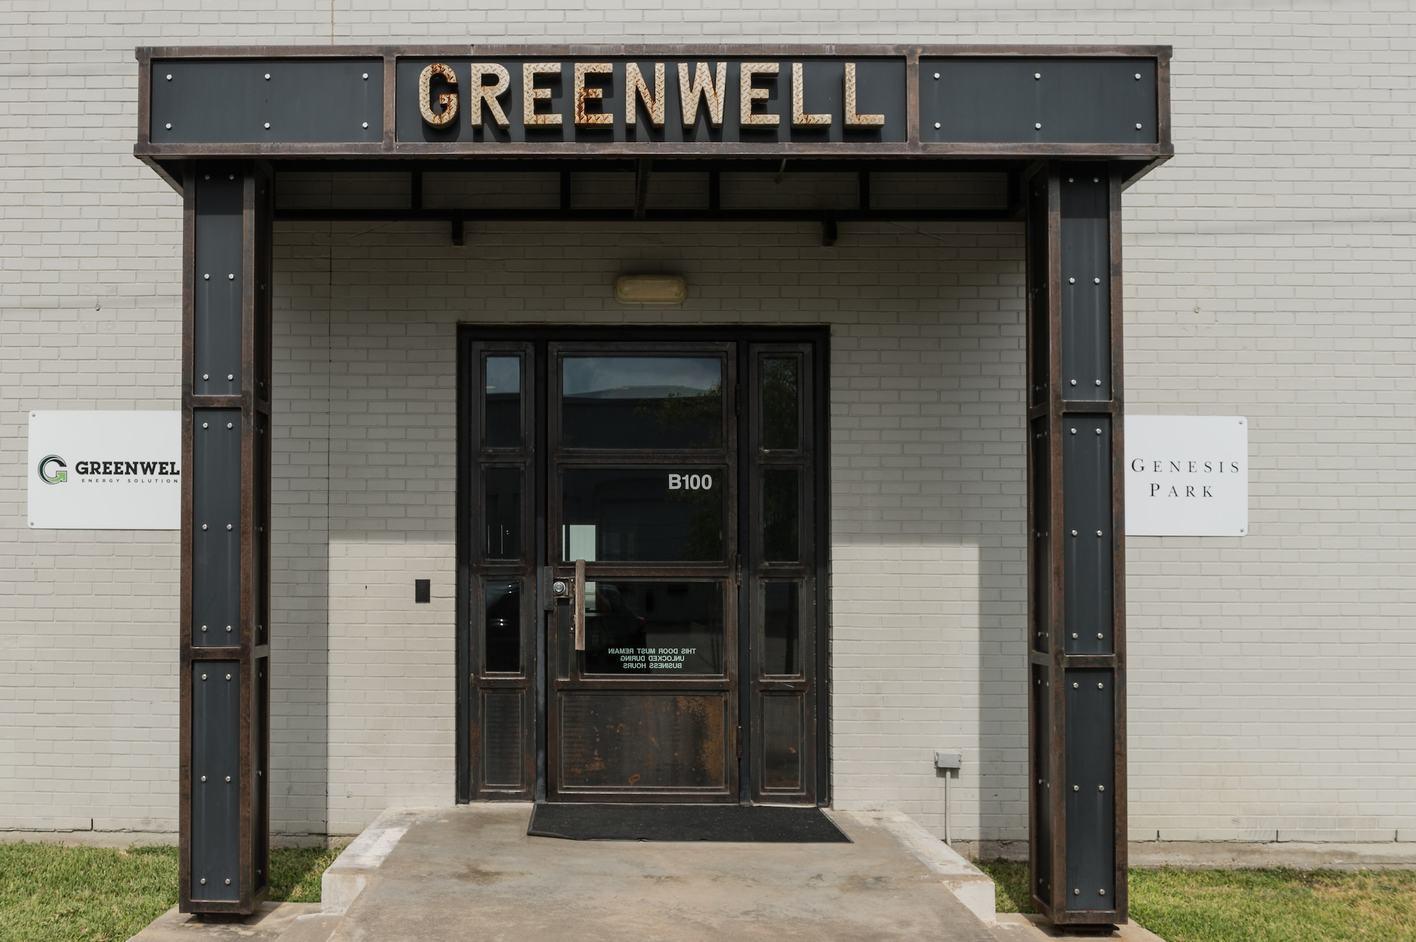 161025__Greenwell_fitlow_102-min_59